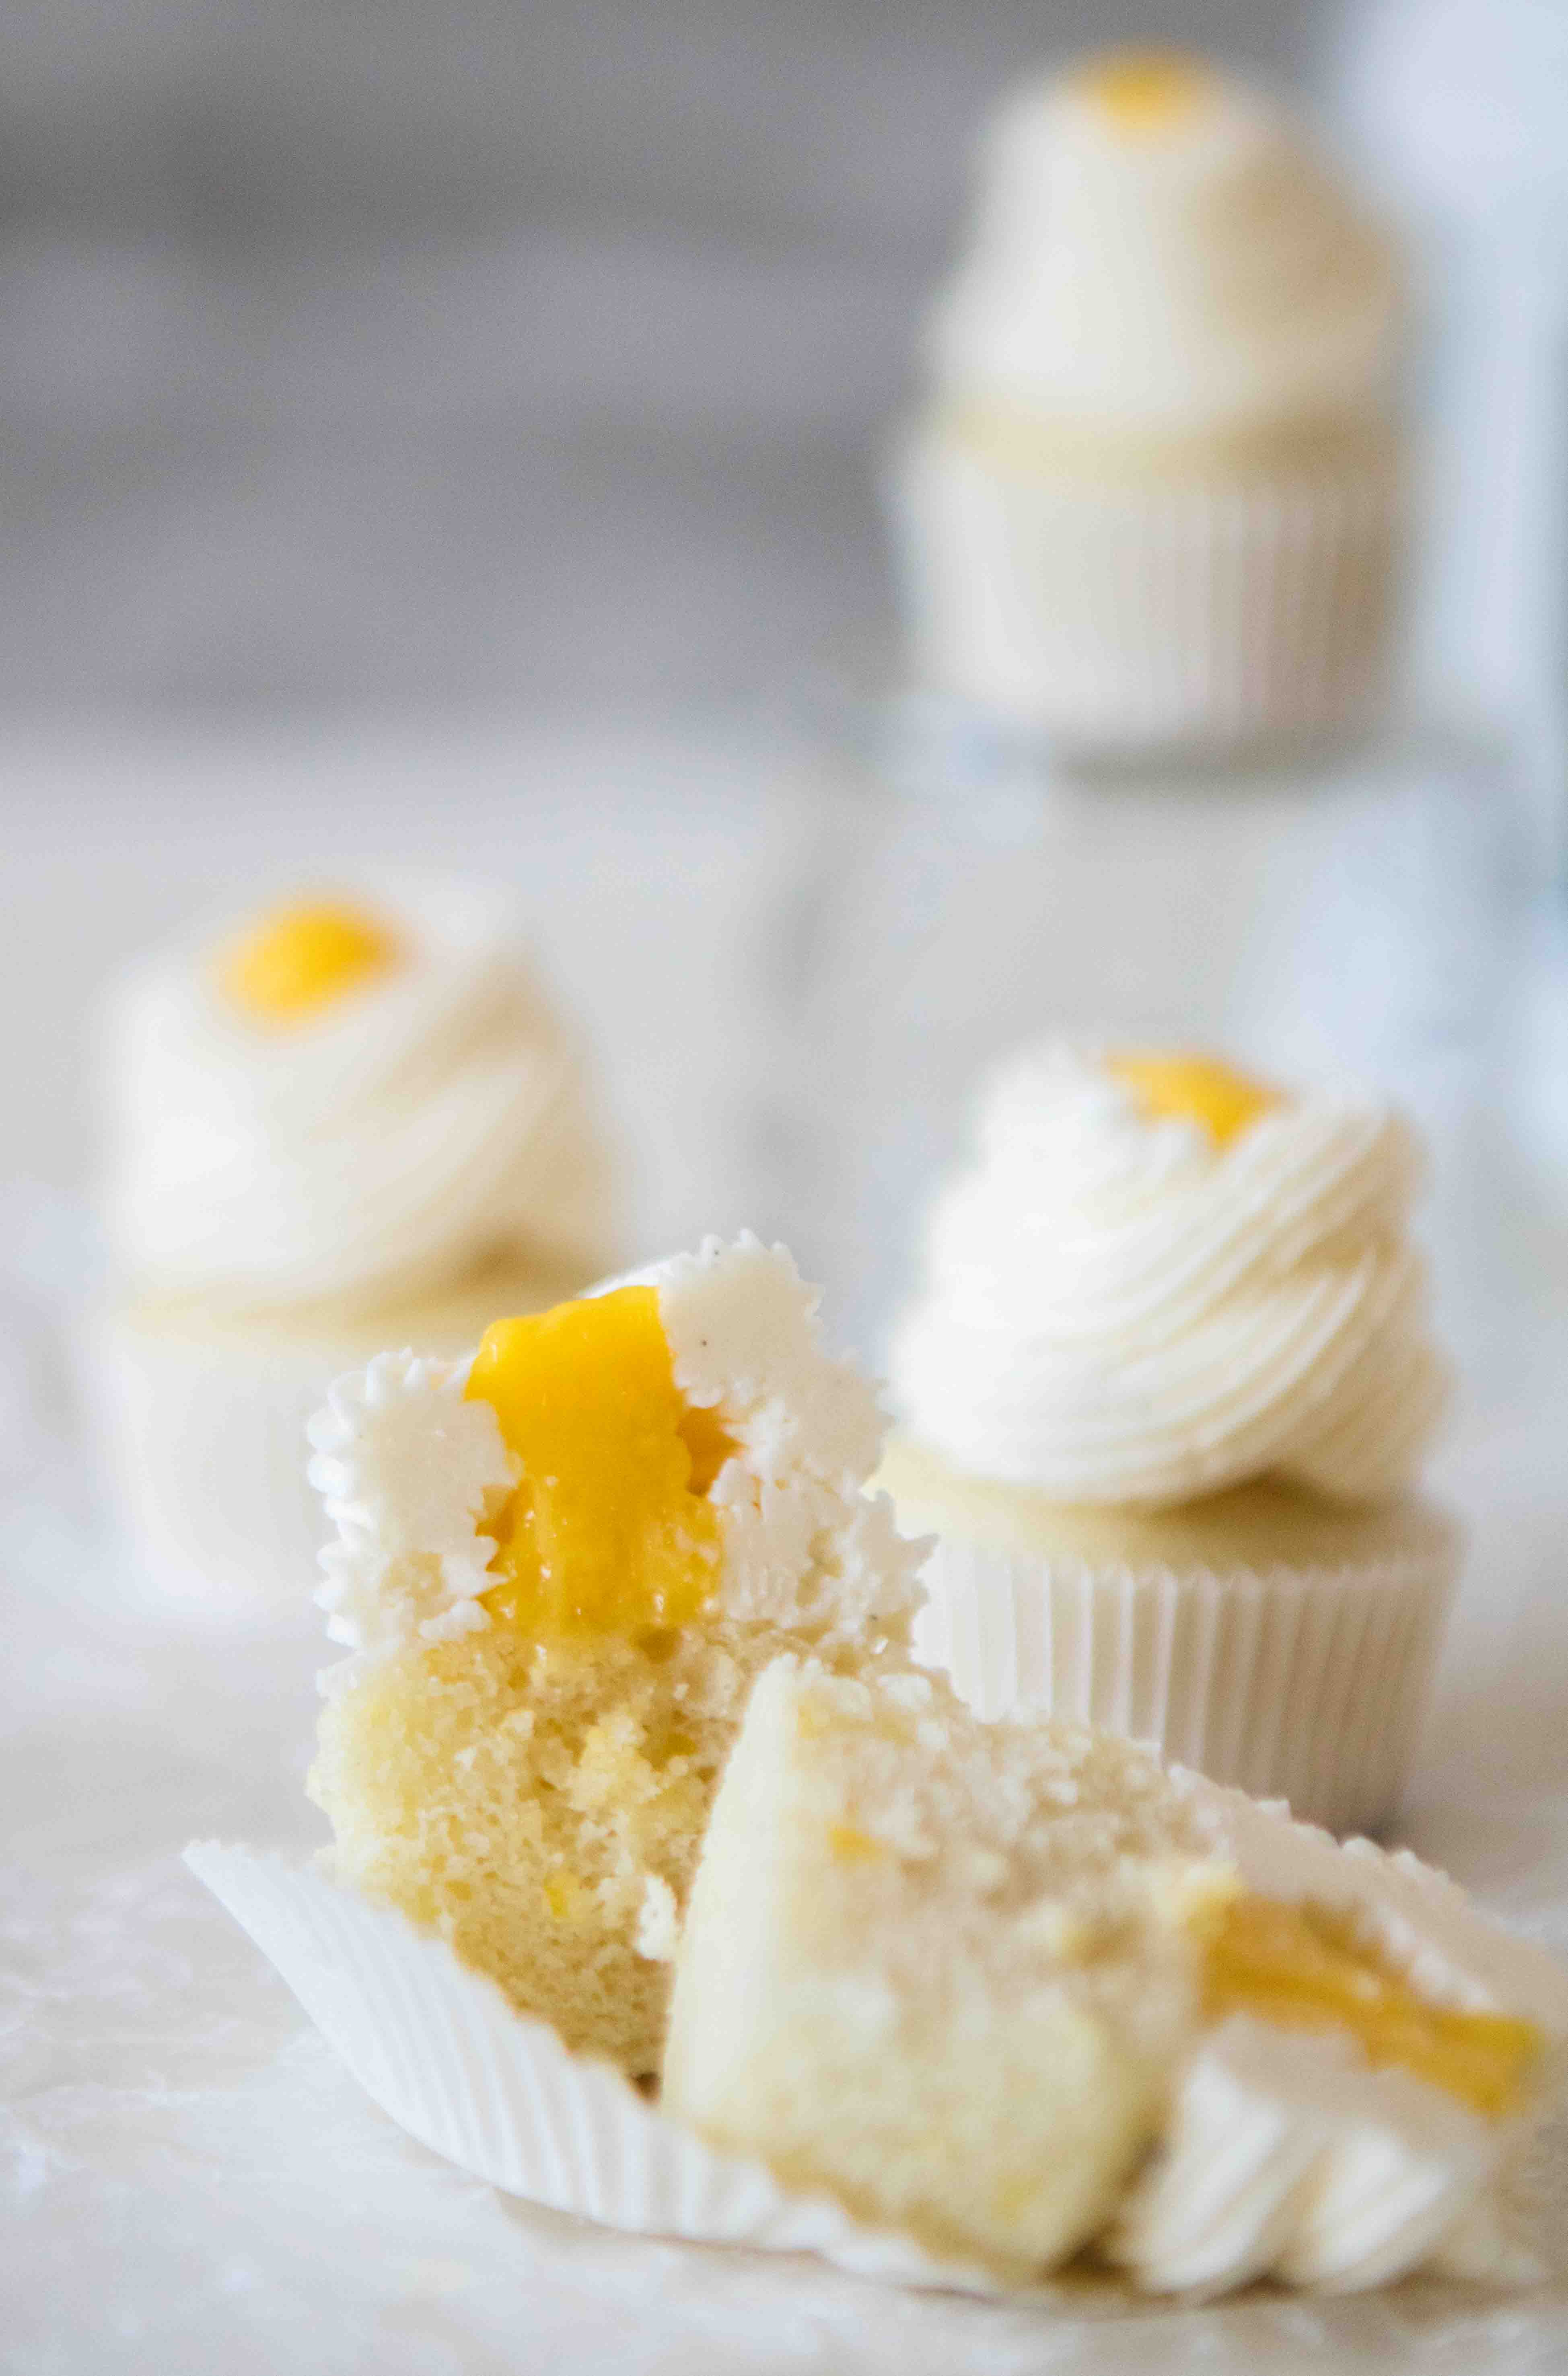 Lemon curd filled lemon cupcakes